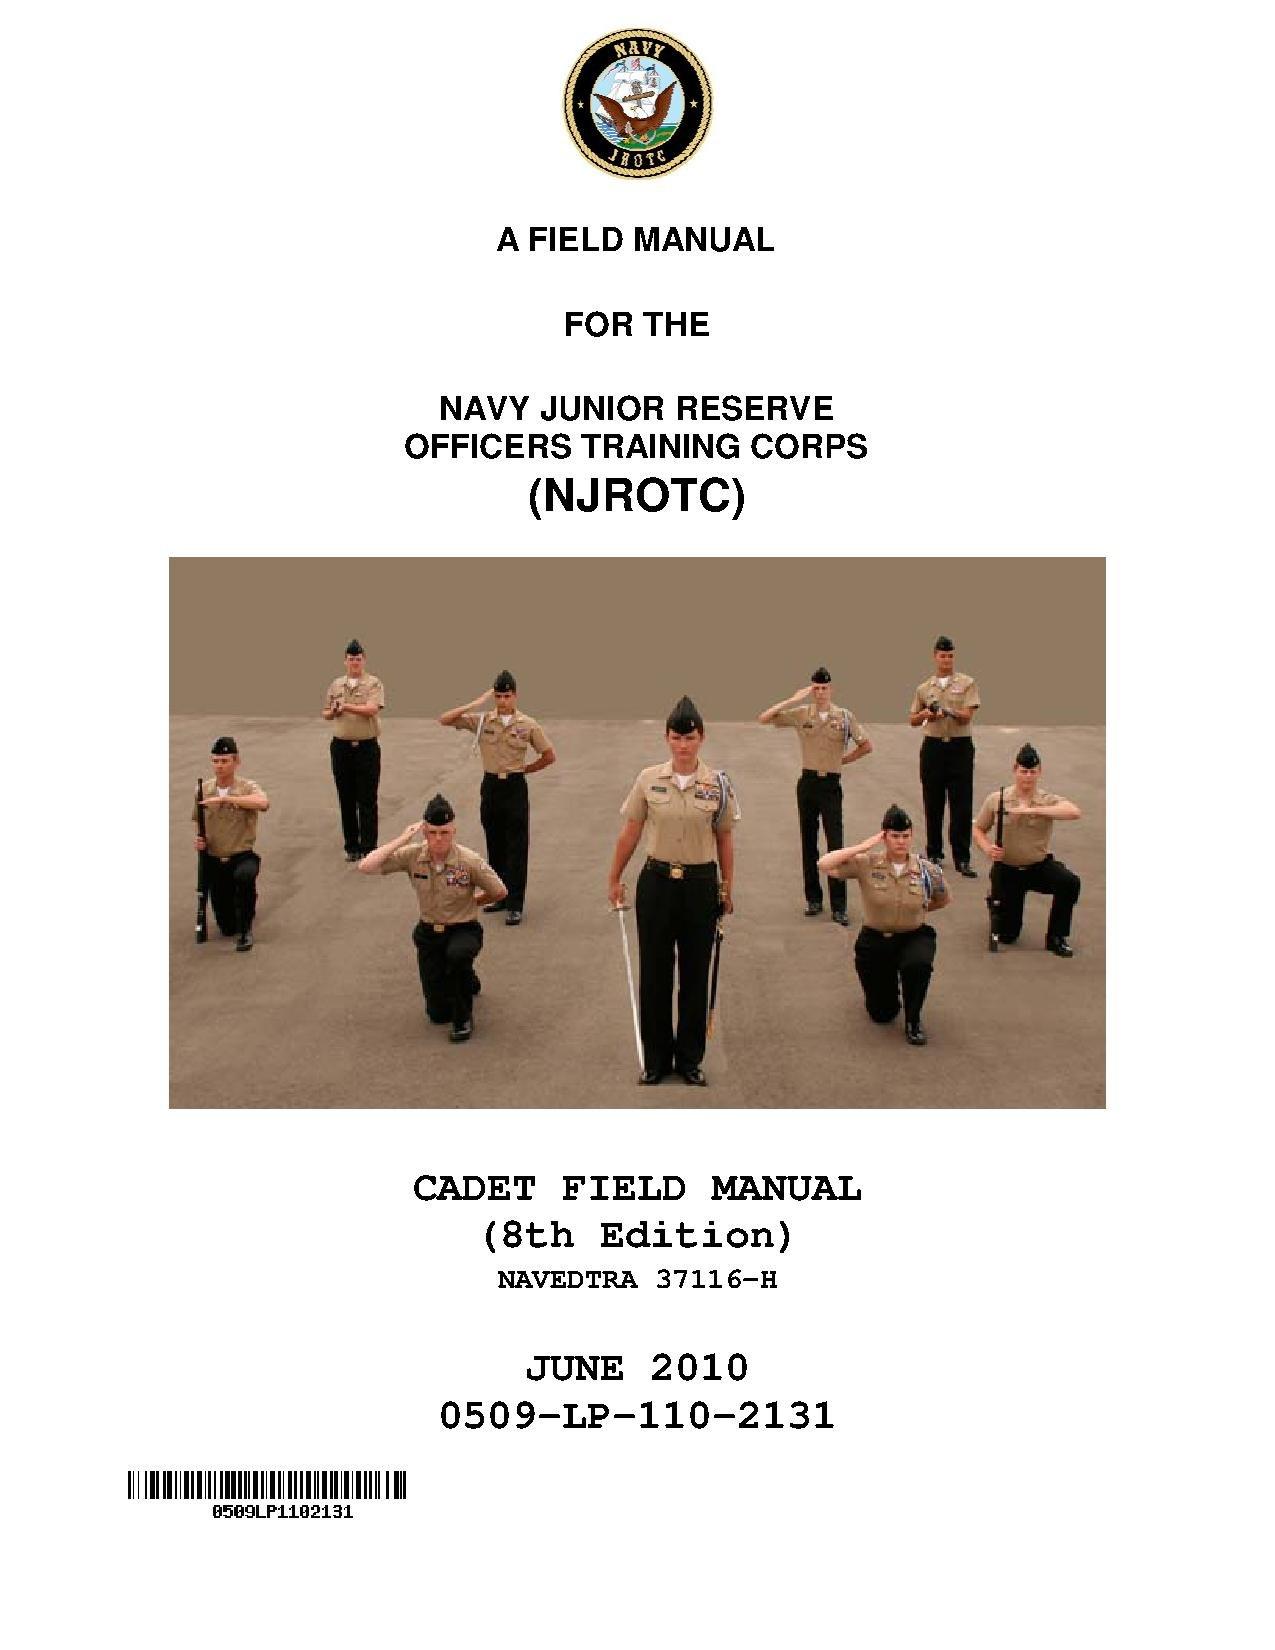 File:NJROTC Cadet Field Manual (June 2010).pdf - Wikimedia Commons